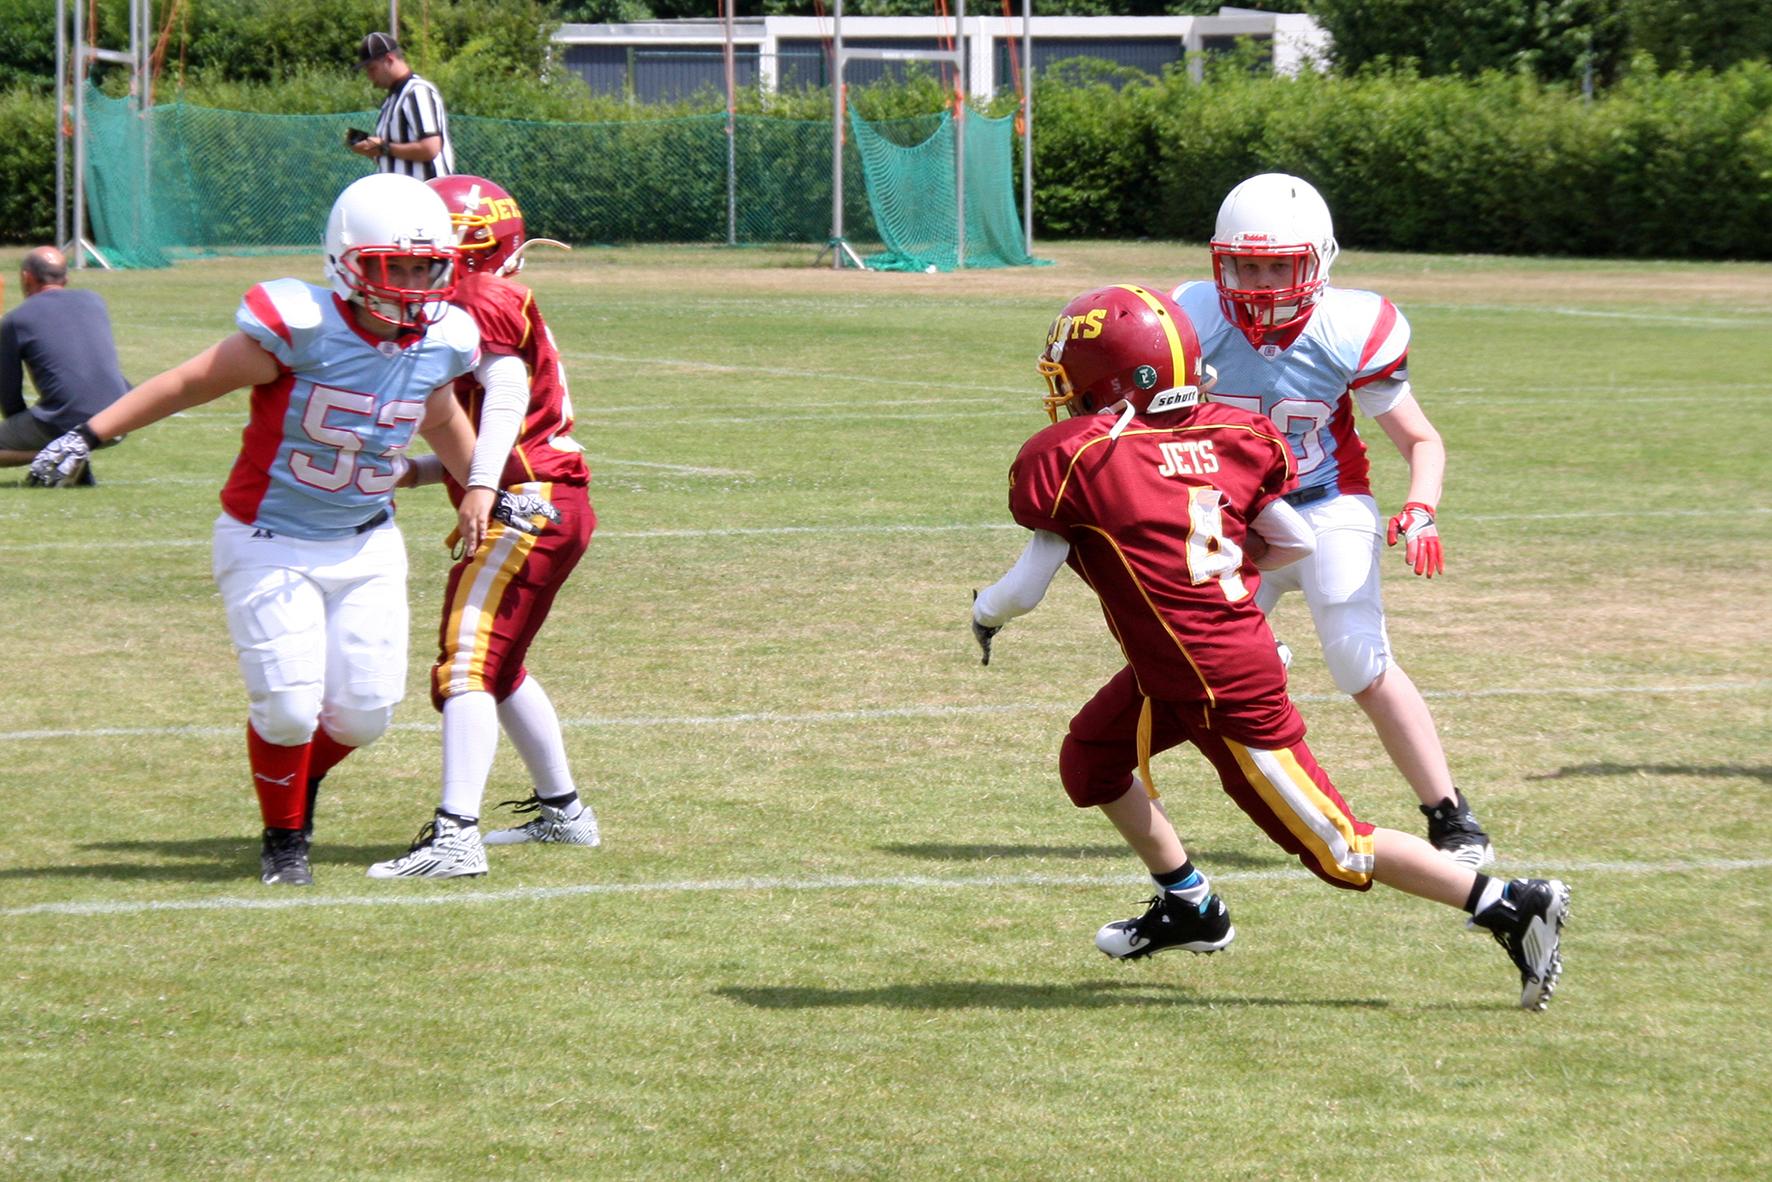 Troisdorf Jets: Jugendfootball & Cheerleading